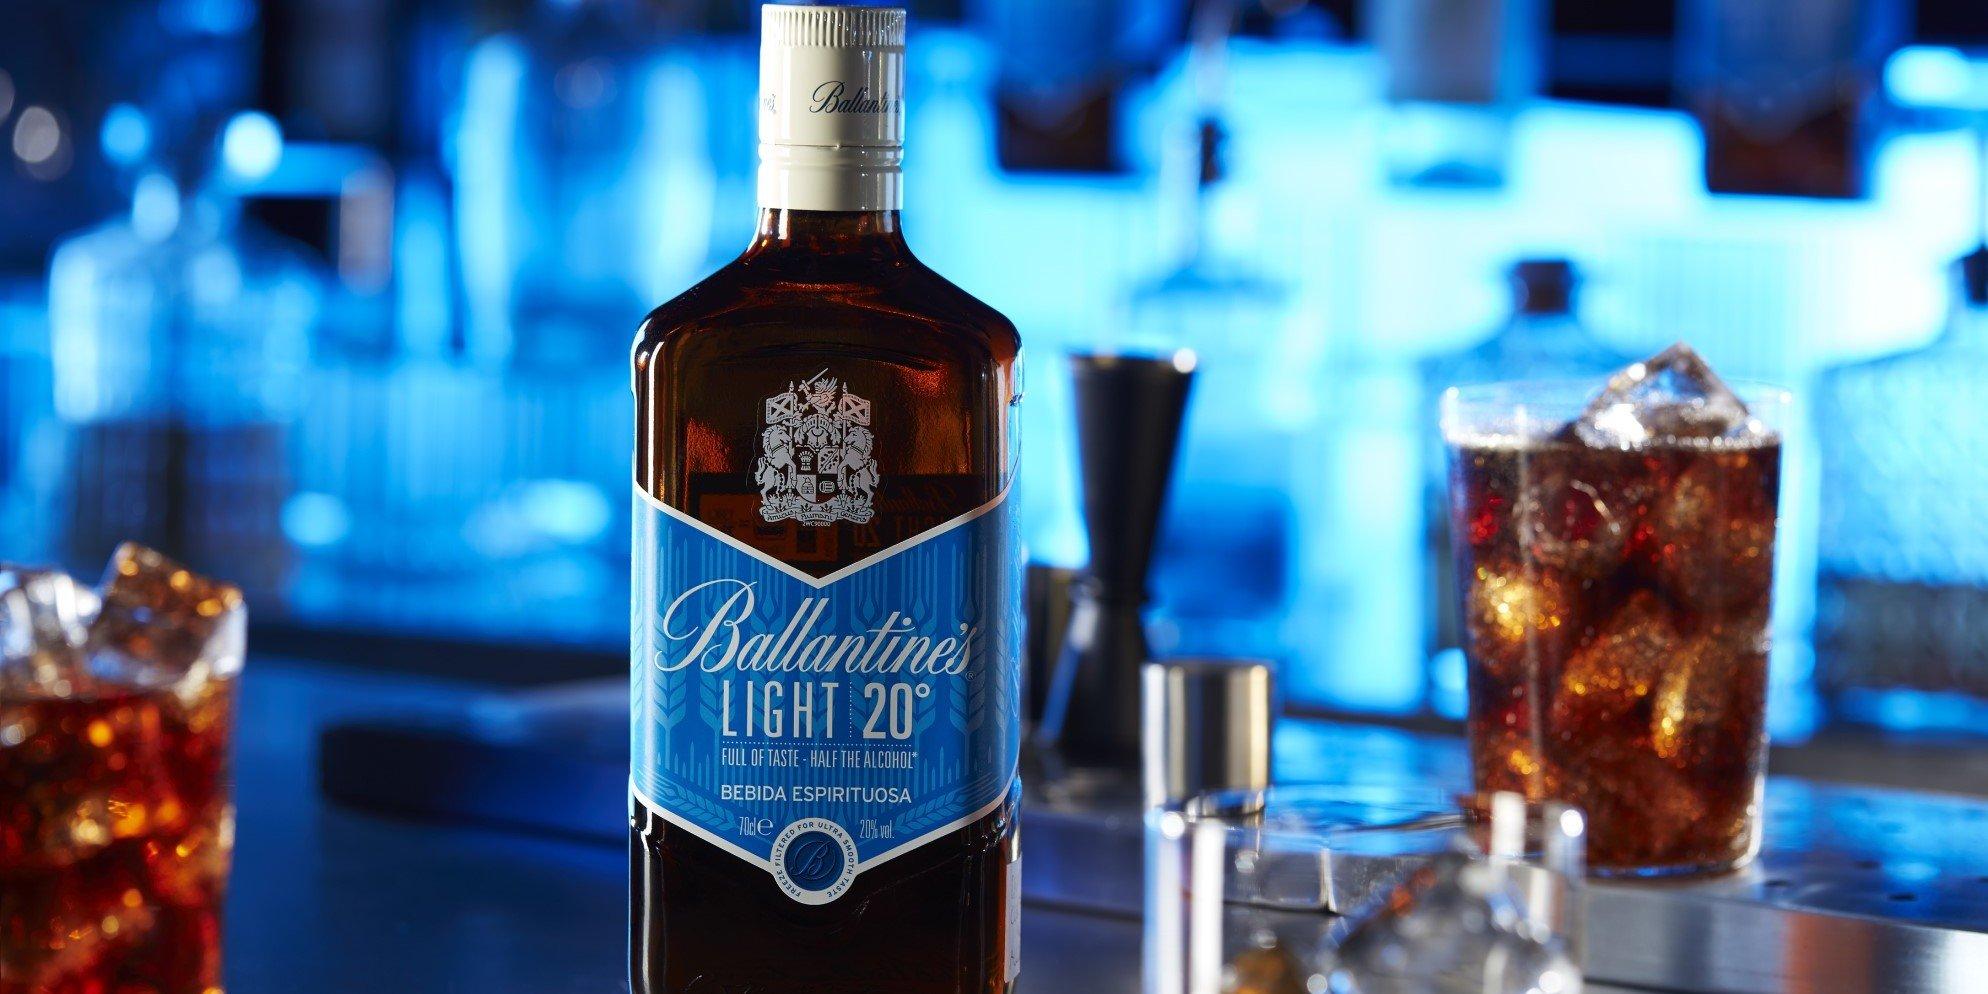 Ballantine's Light served with cola